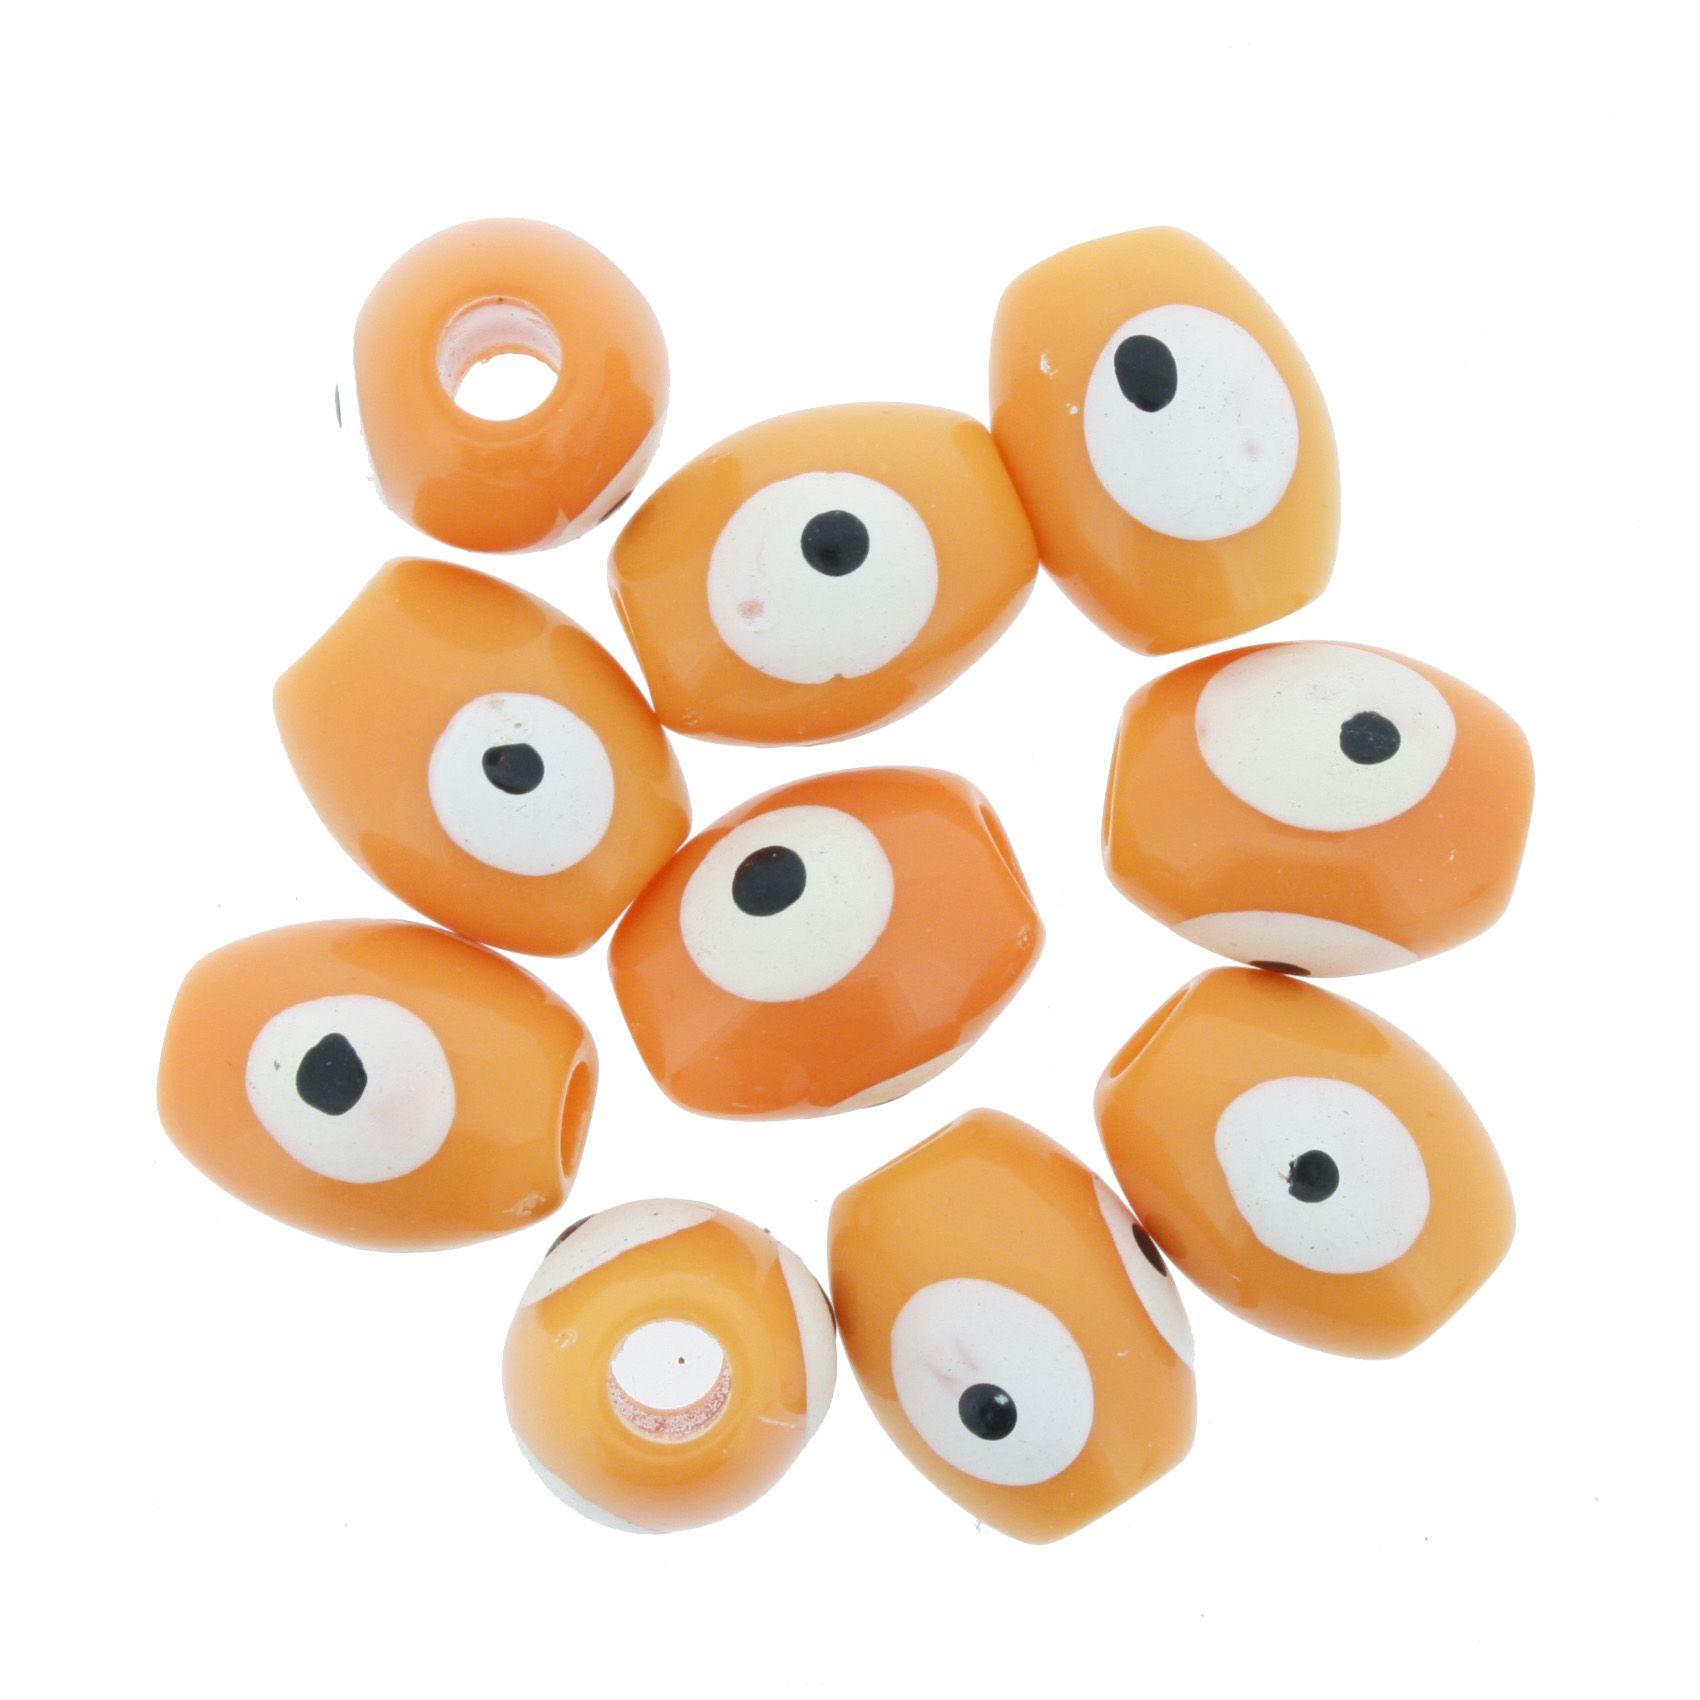 Olho Grego - Oval - Laranja - 13x10mm  - Stéphanie Bijoux® - Peças para Bijuterias e Artesanato